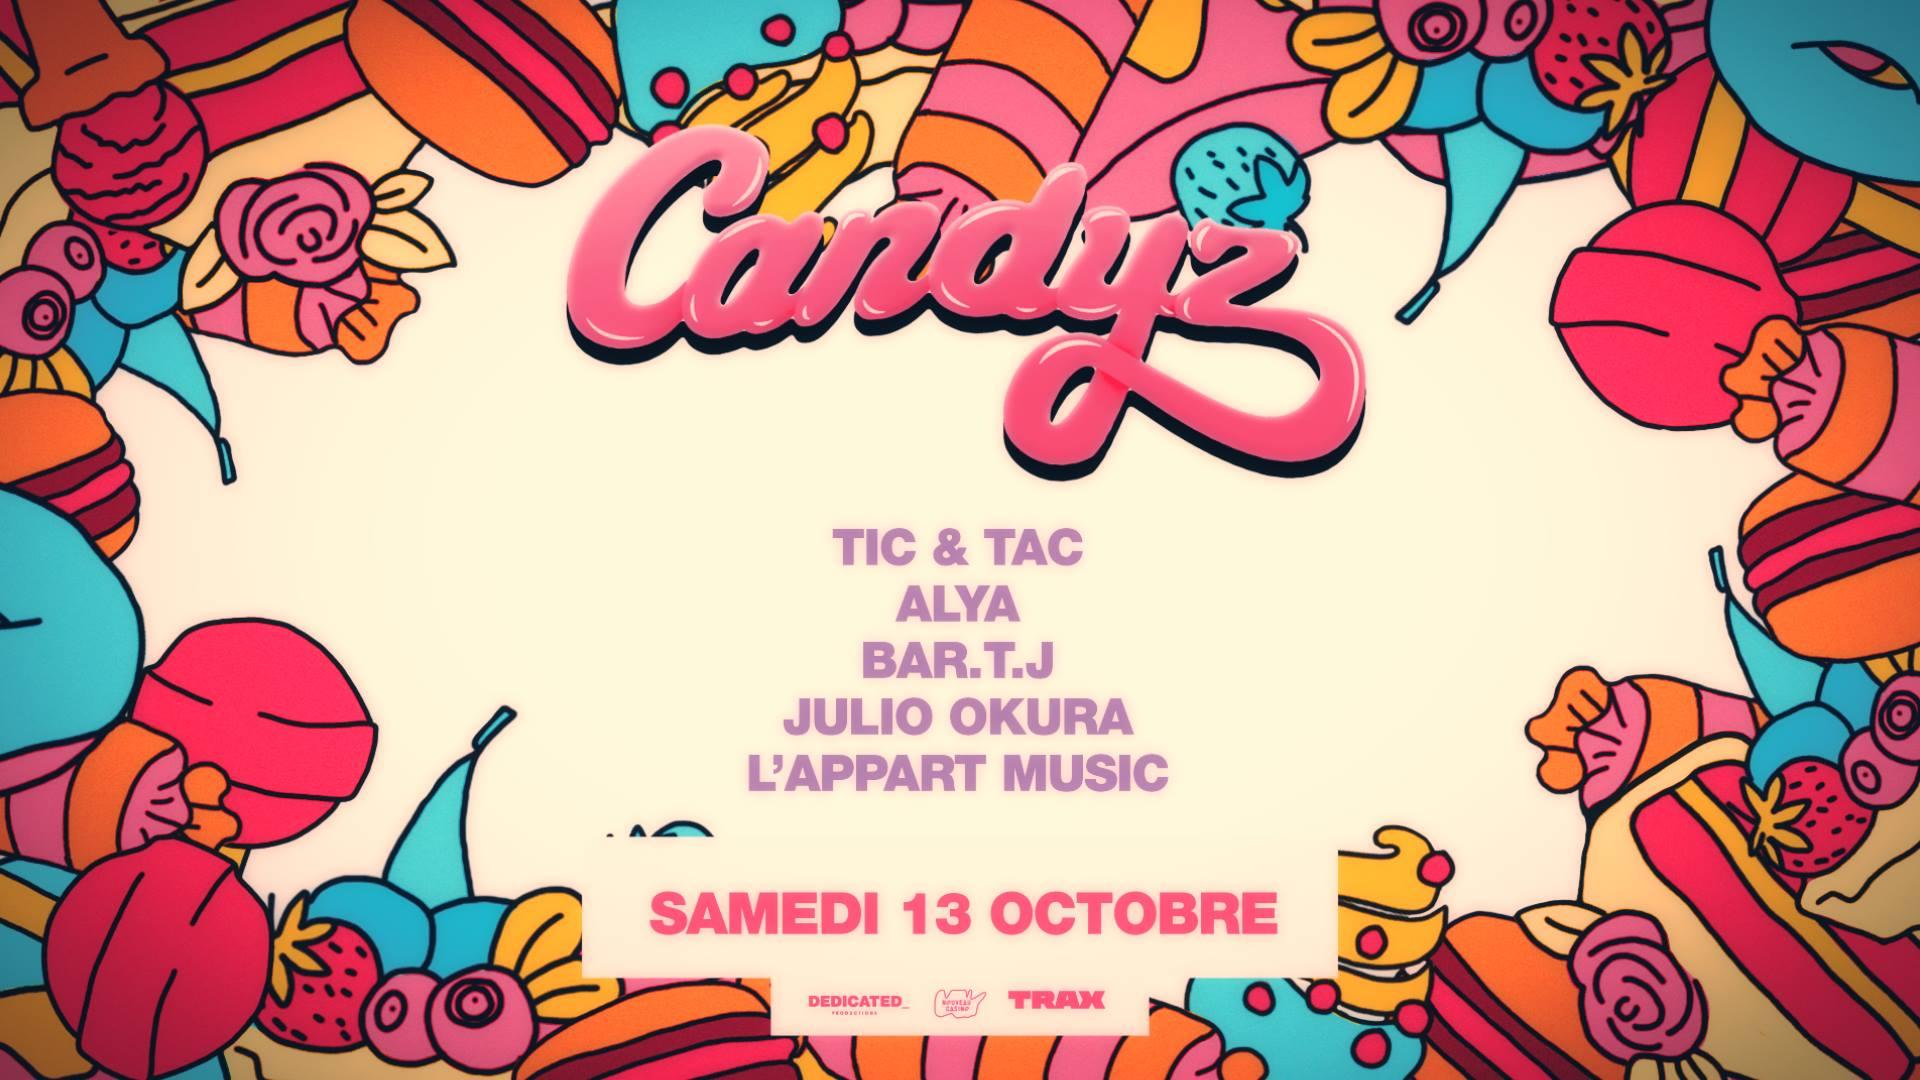 Candyz • Tic & Tac